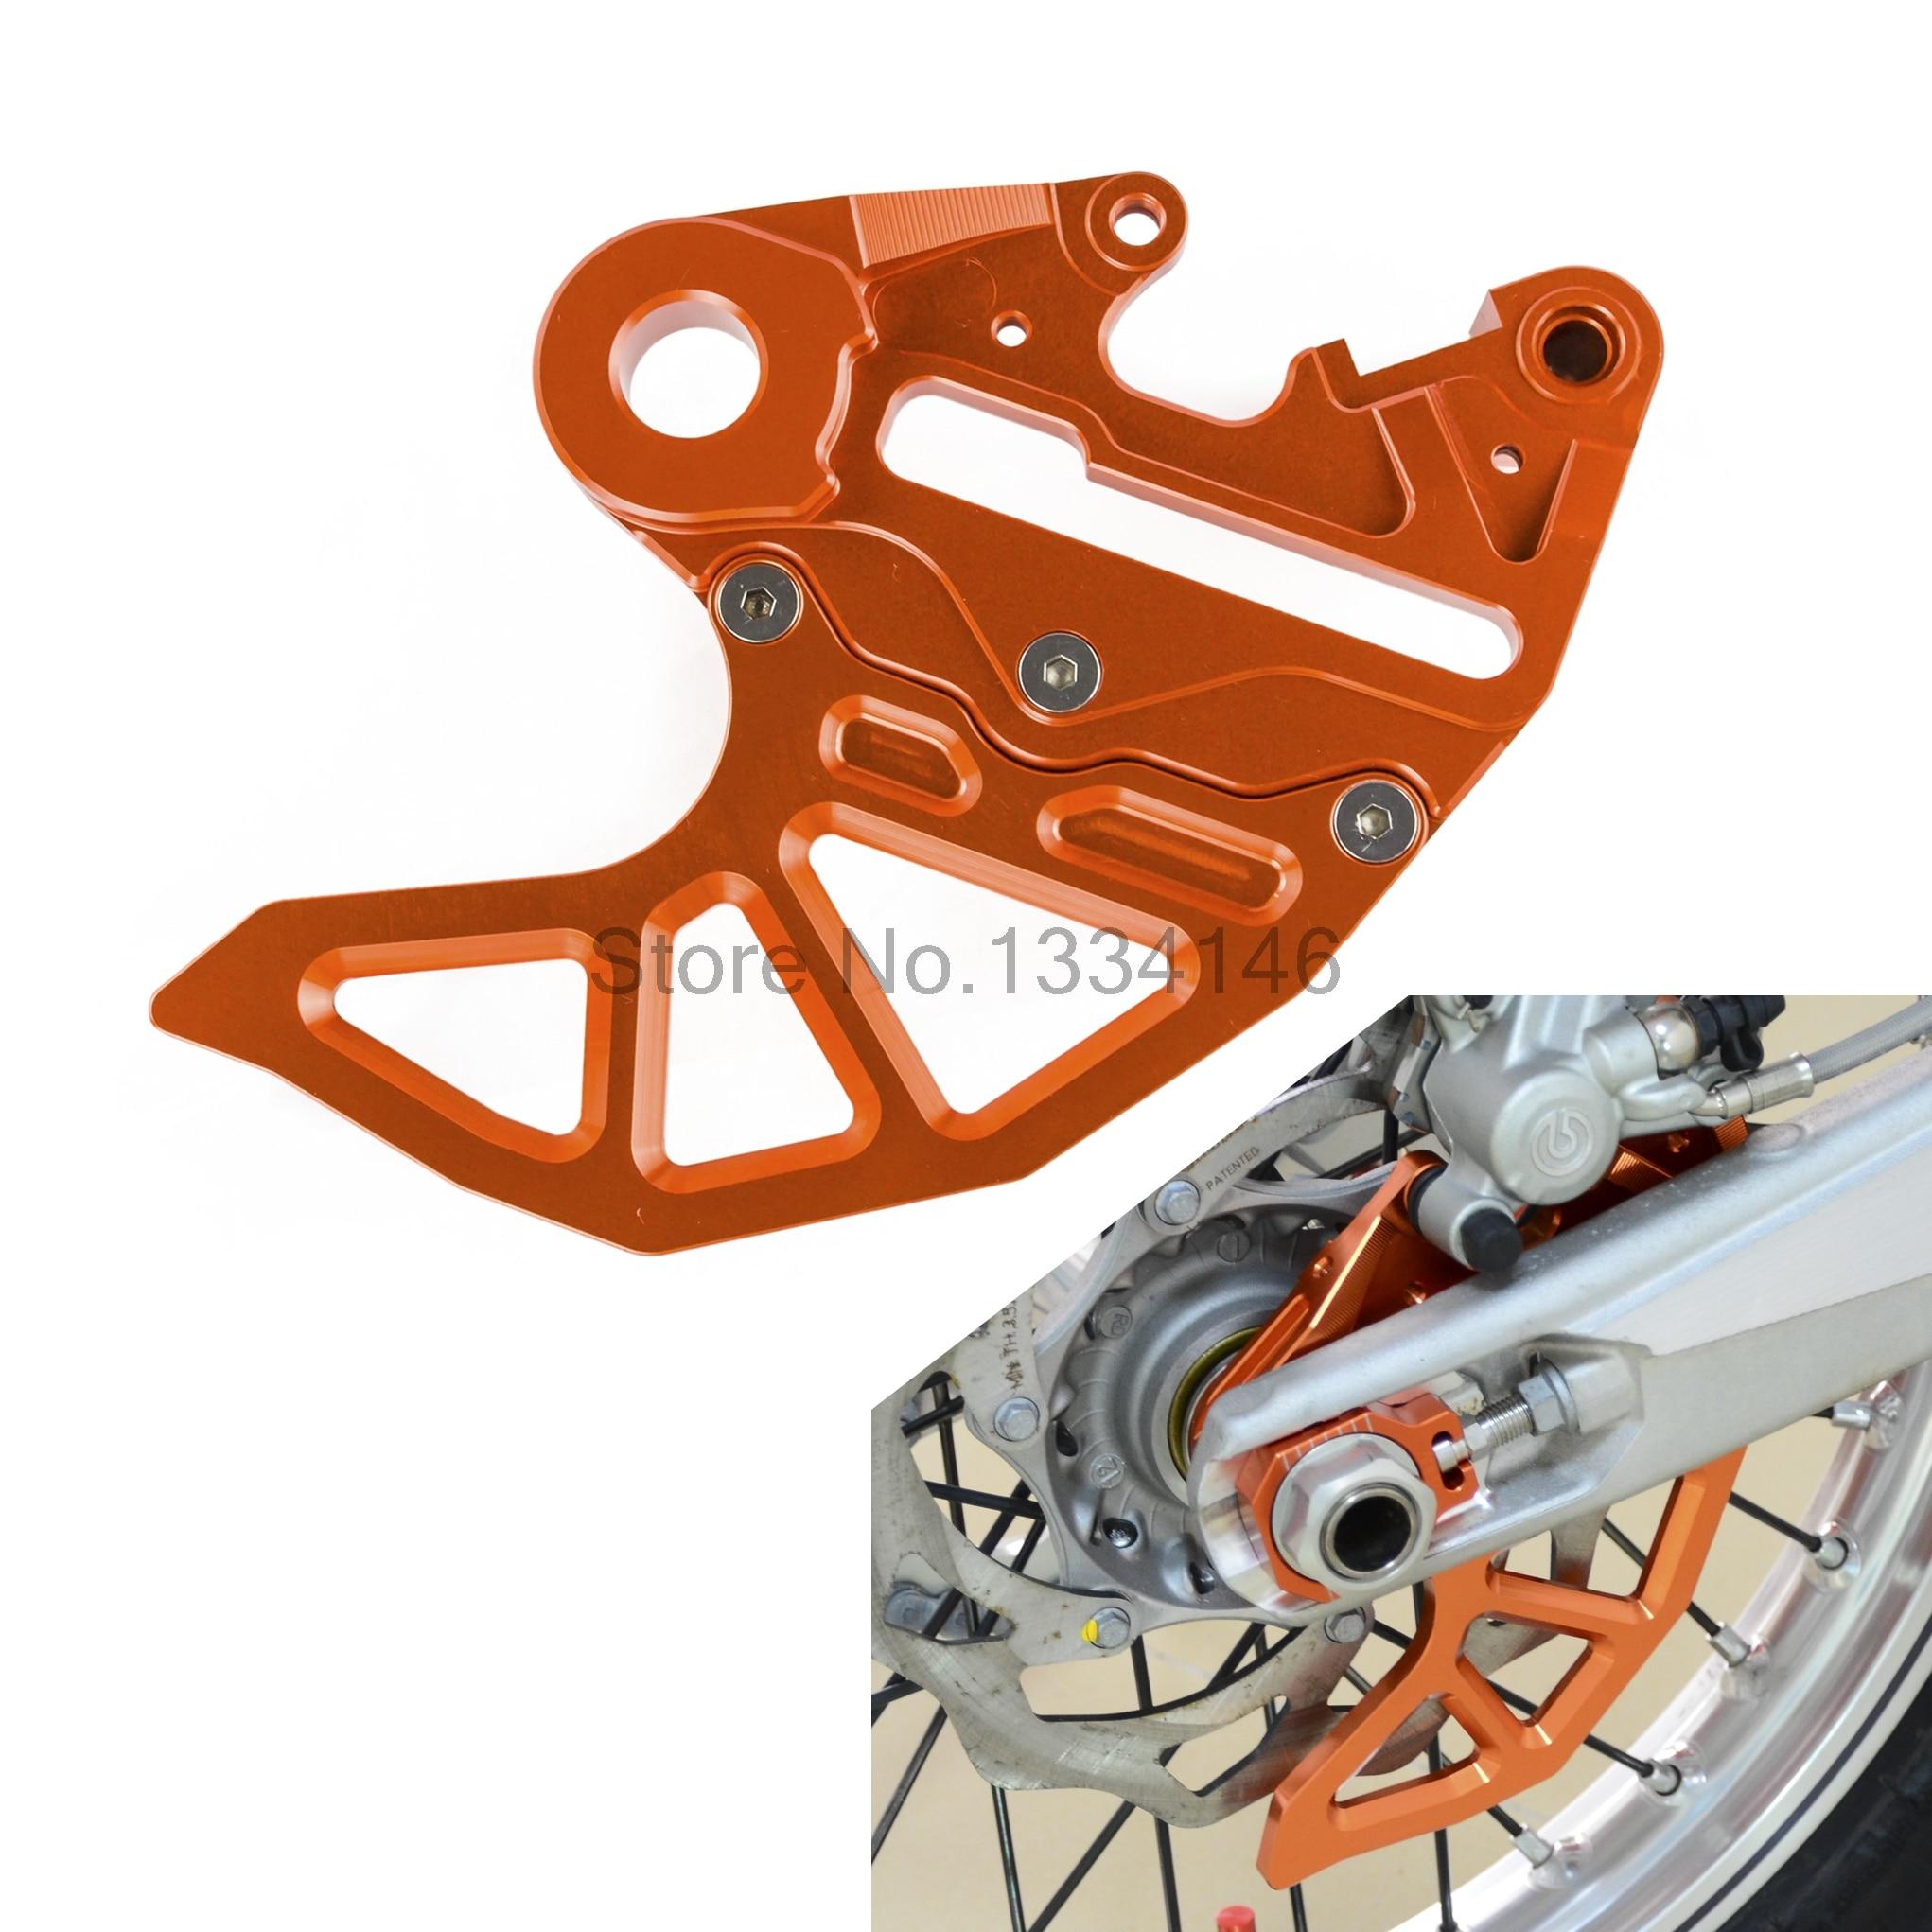 ФОТО Caliper Support Rear Brake Disc Guard For KTM 125 200 250 300 390 450 530 SX/SX-F EXC/EXC-F/XC-W/XCF-W